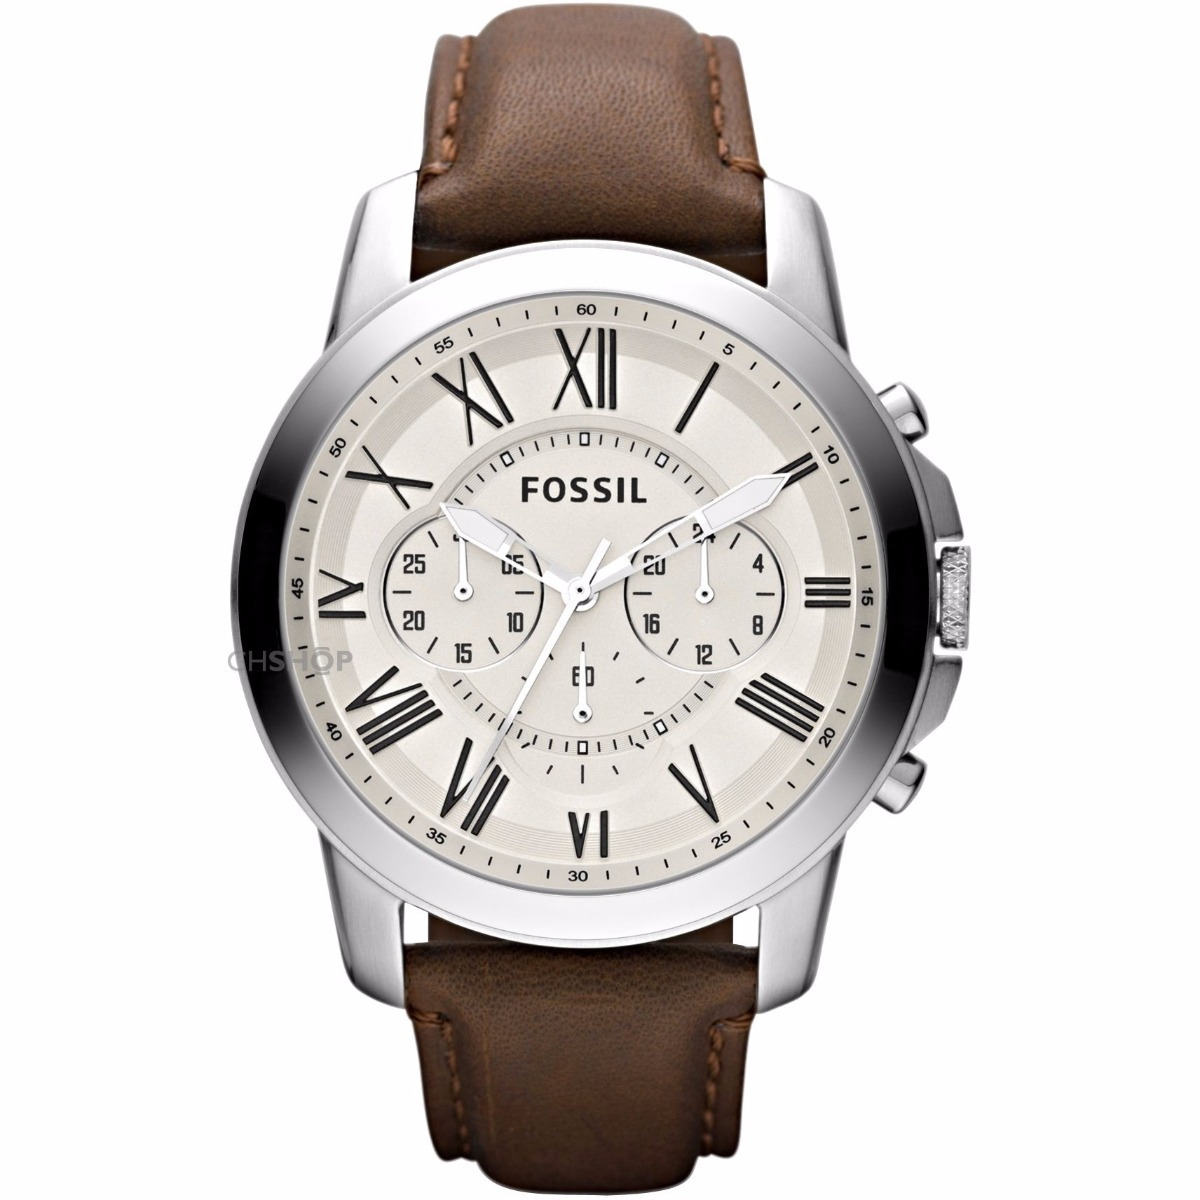 a68fdfc86d4f reloj fossil para hombre modelo  fs4735ie envio gratis. Cargando zoom.